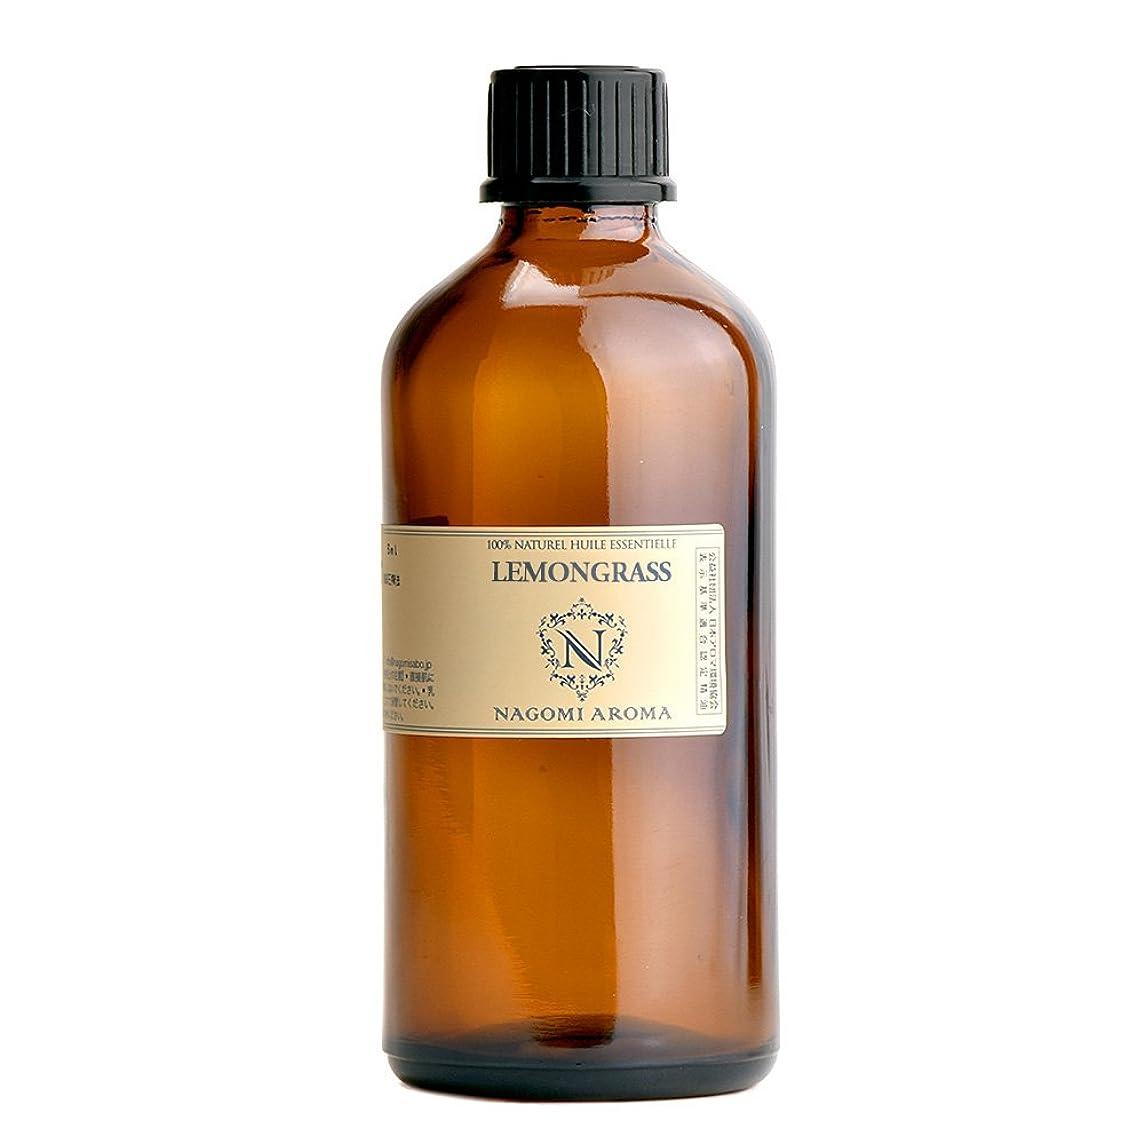 NAGOMI AROMA レモングラス 100ml 【AEAJ認定精油】【アロマオイル】